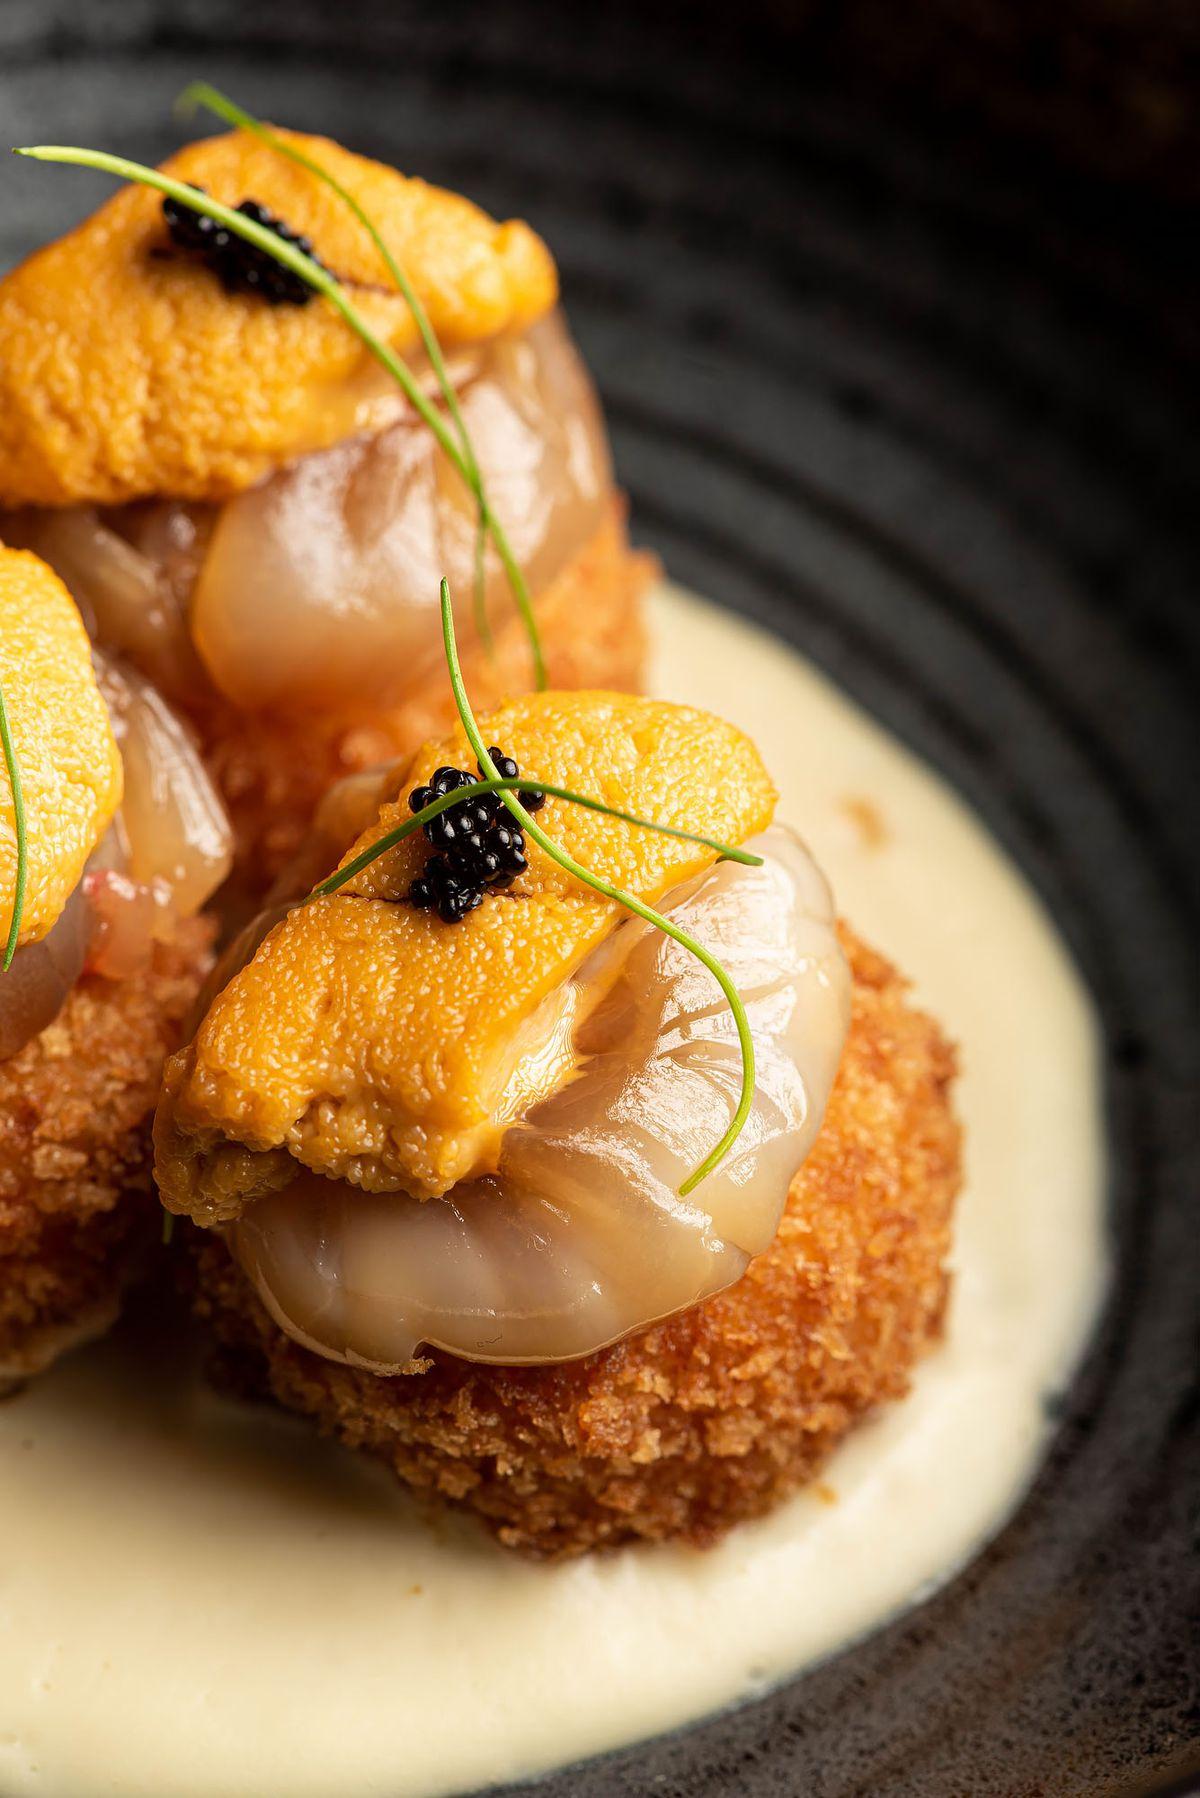 Closeup of truffle potato dish with uni, shrimp, and caviar.